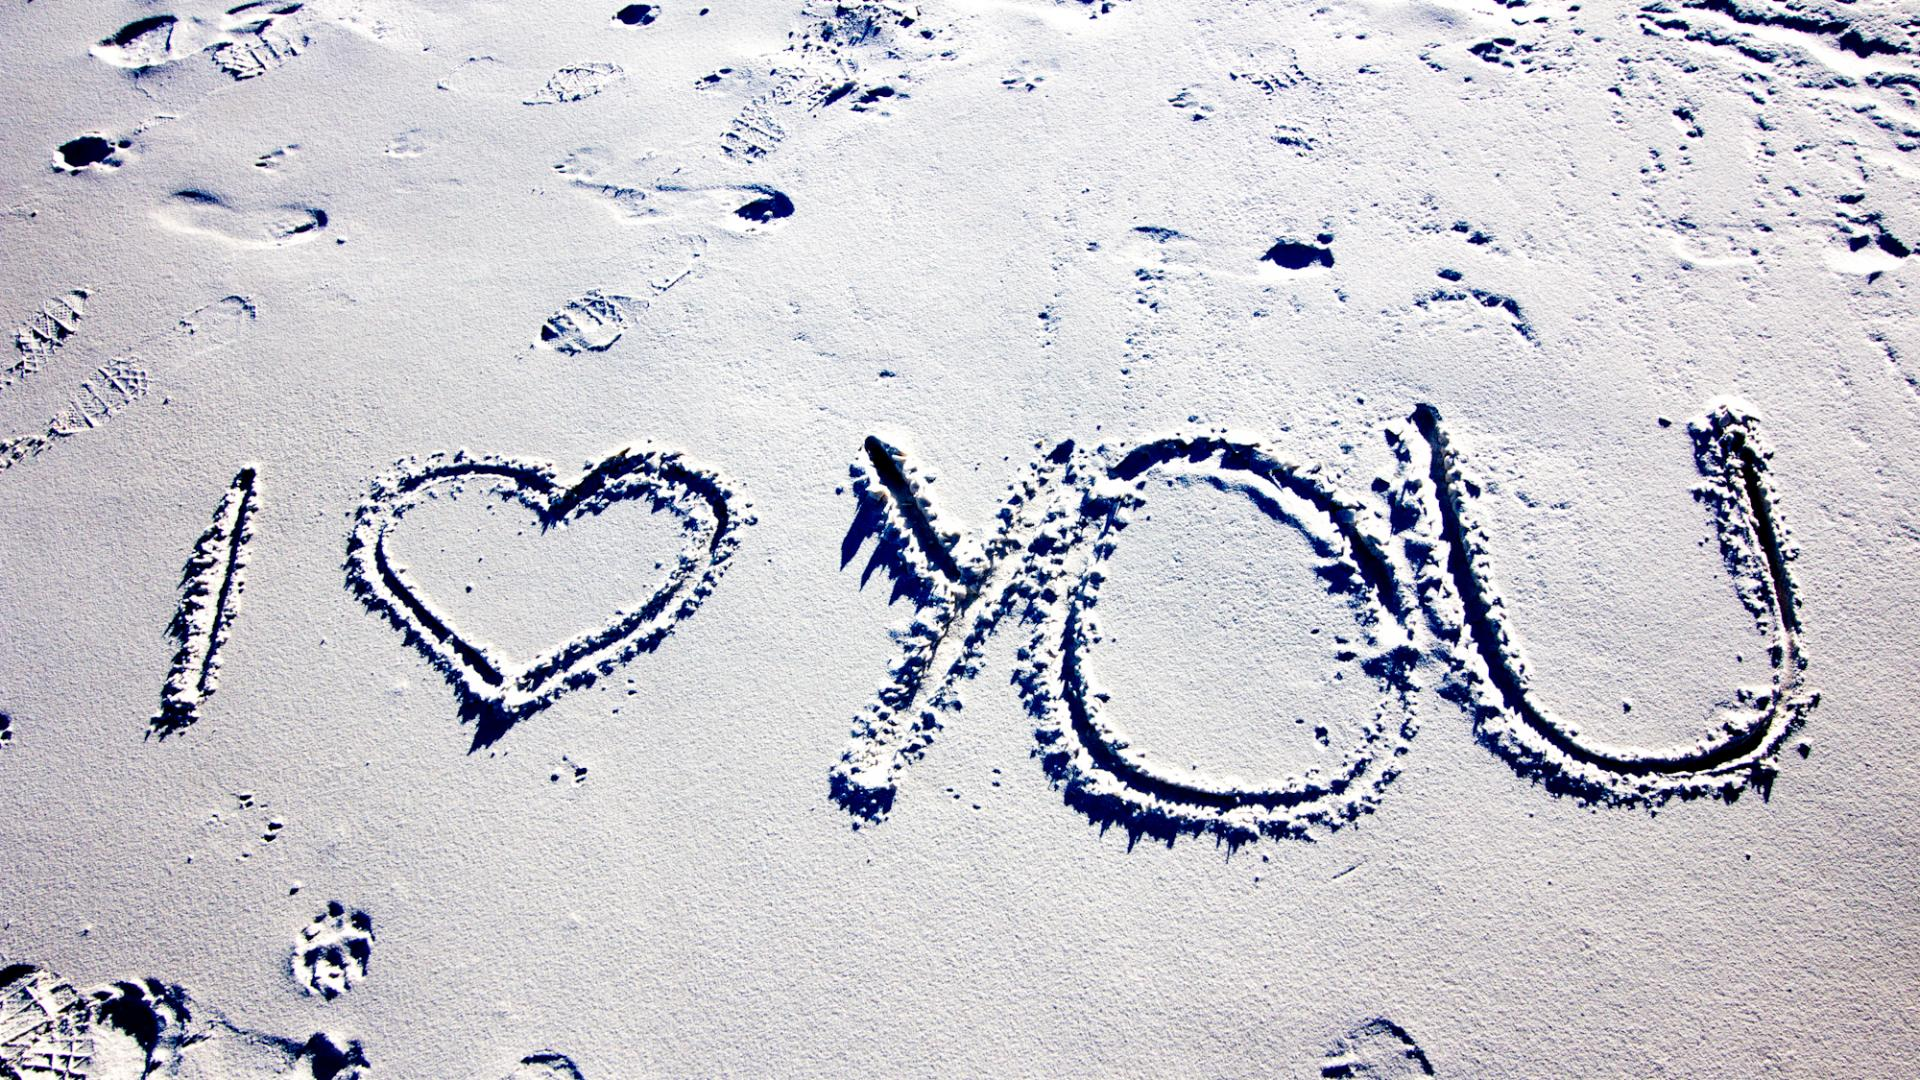 Drawn sand i love you Wallpaper You HD Love Sand